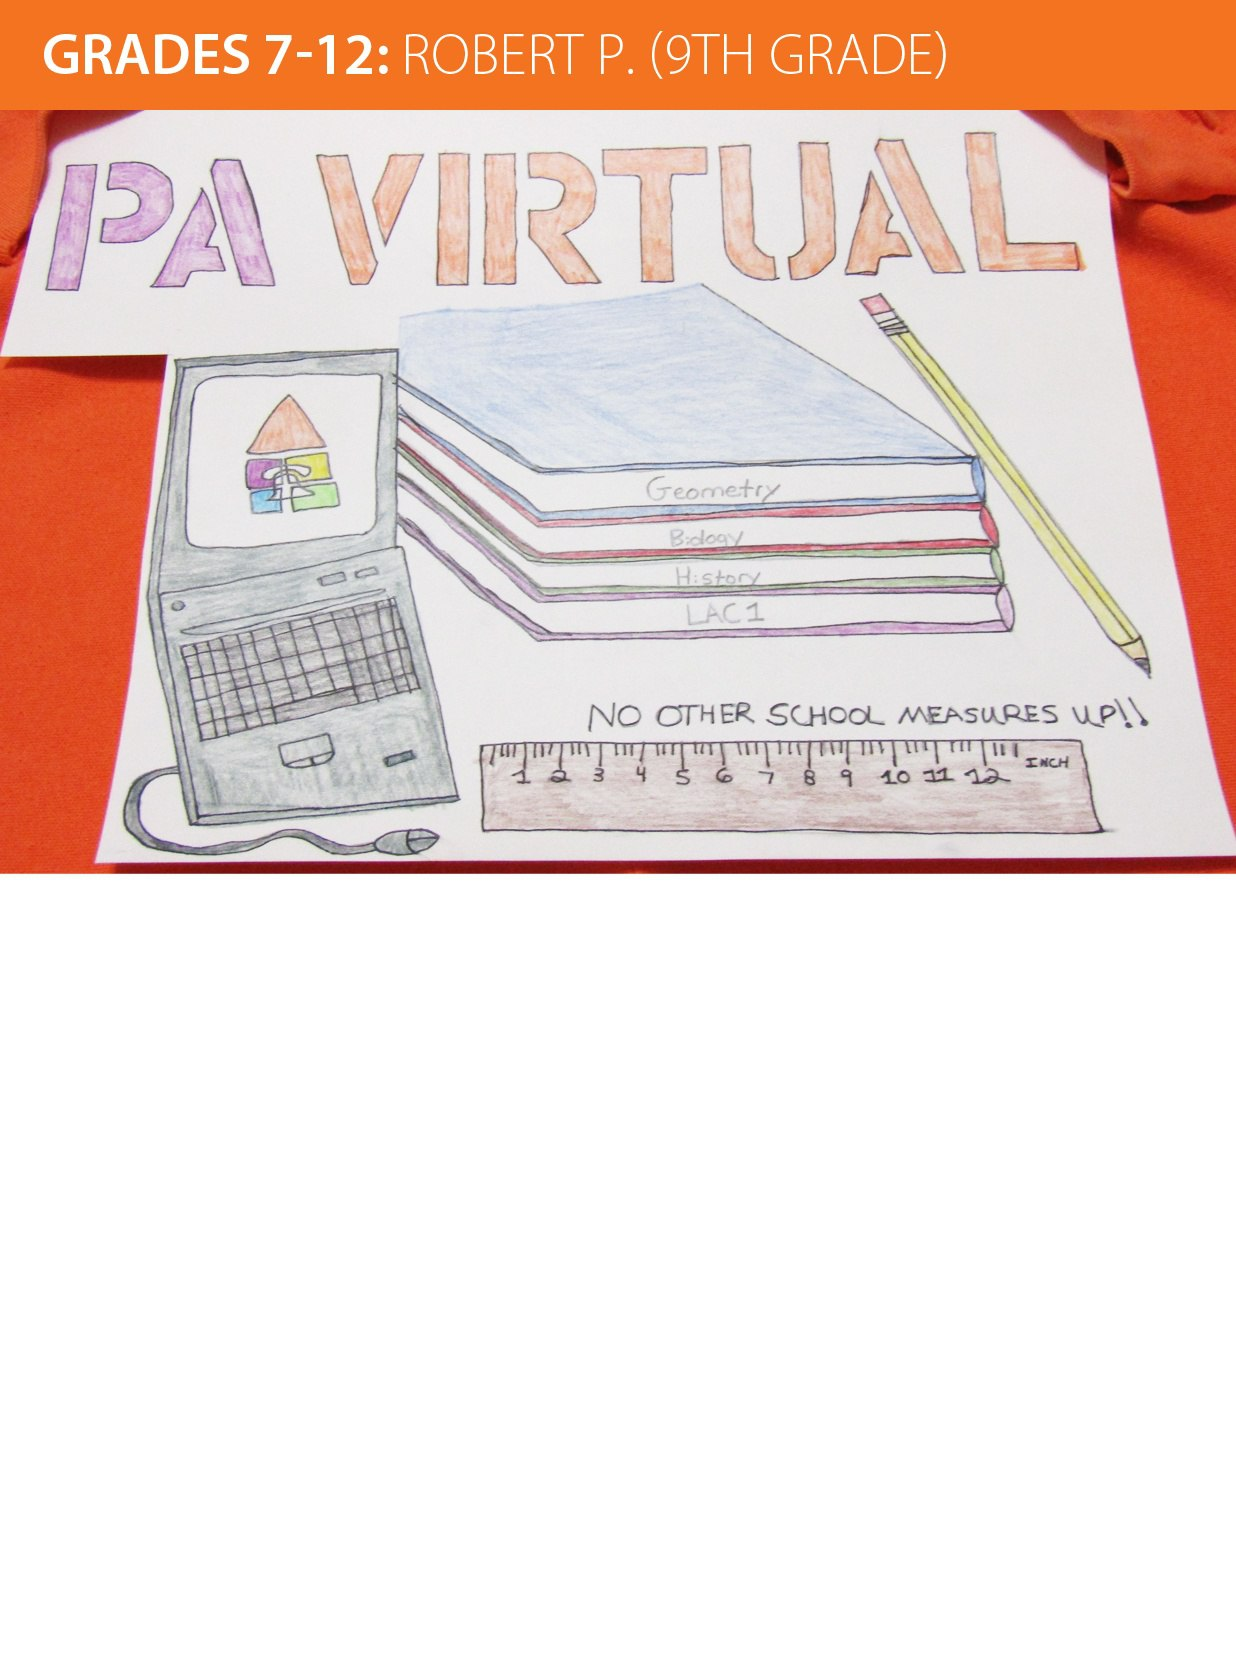 PA_Virtual_Art_Contest_Robert_P_Grade9